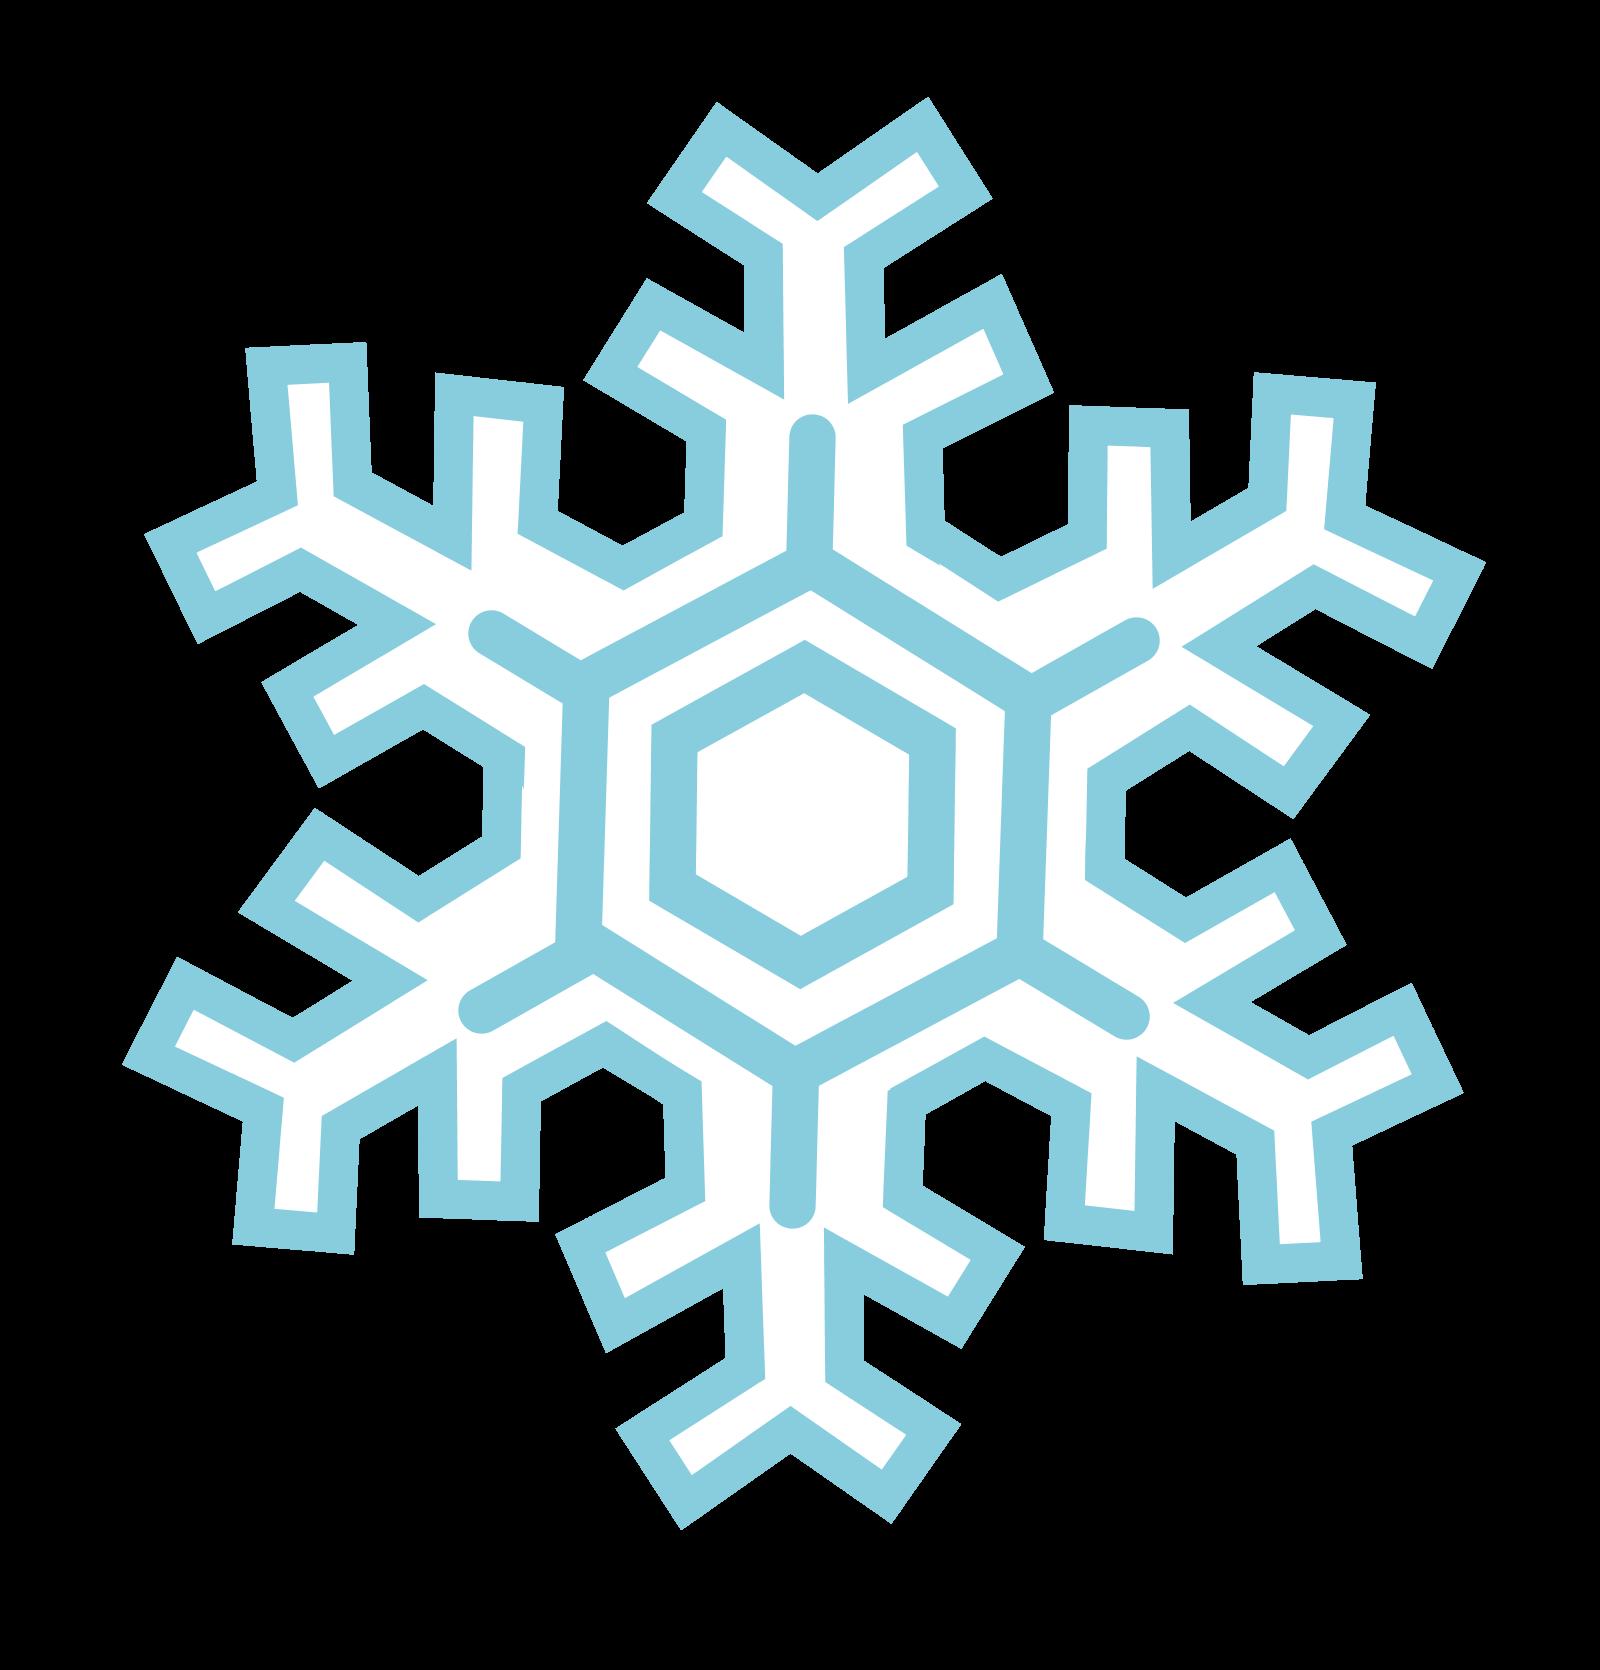 Stylized Snowflakes 20159 Download Royal-Stylized Snowflakes 20159 Download Royalty Free Vector Eps Clipart-15